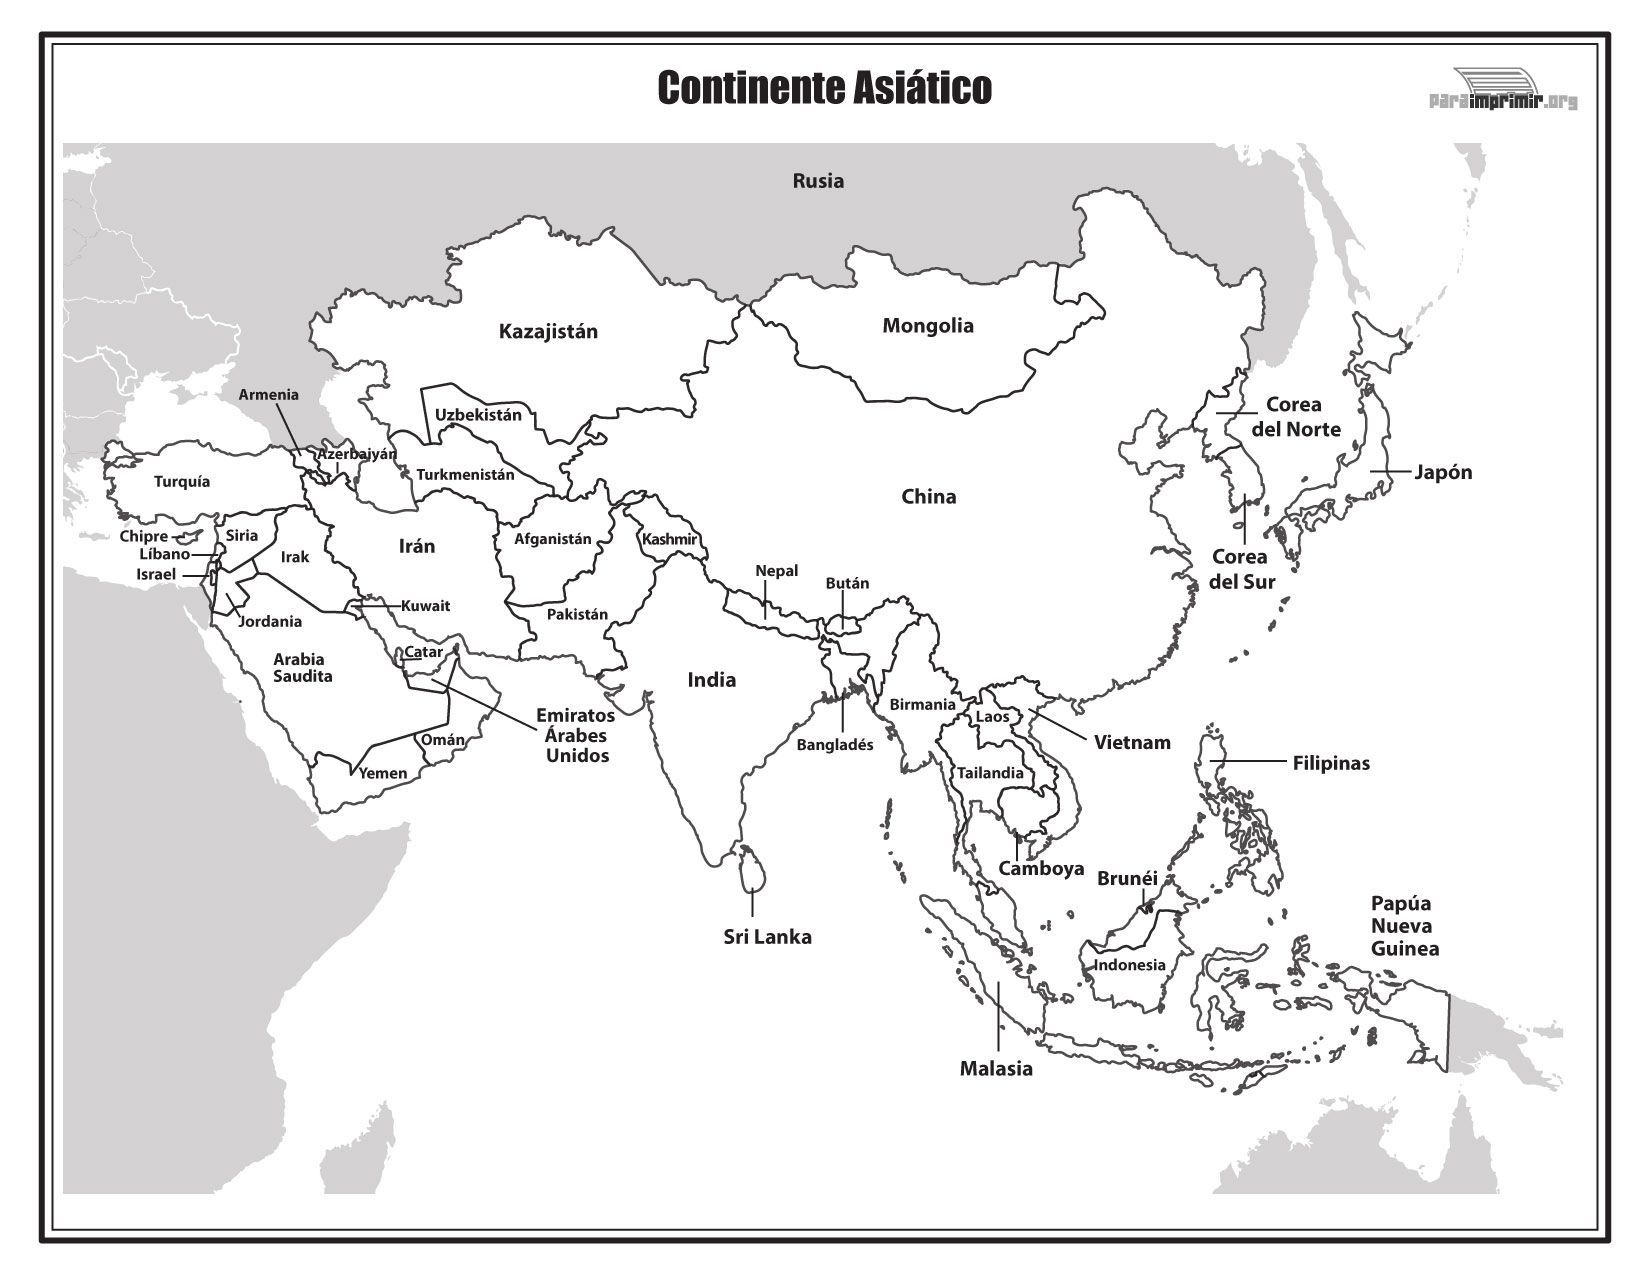 Resultado De Imagen Para Mapa De Asia Para Colorear Mapa De Asia Continente De Asia Mapa Asia Politico